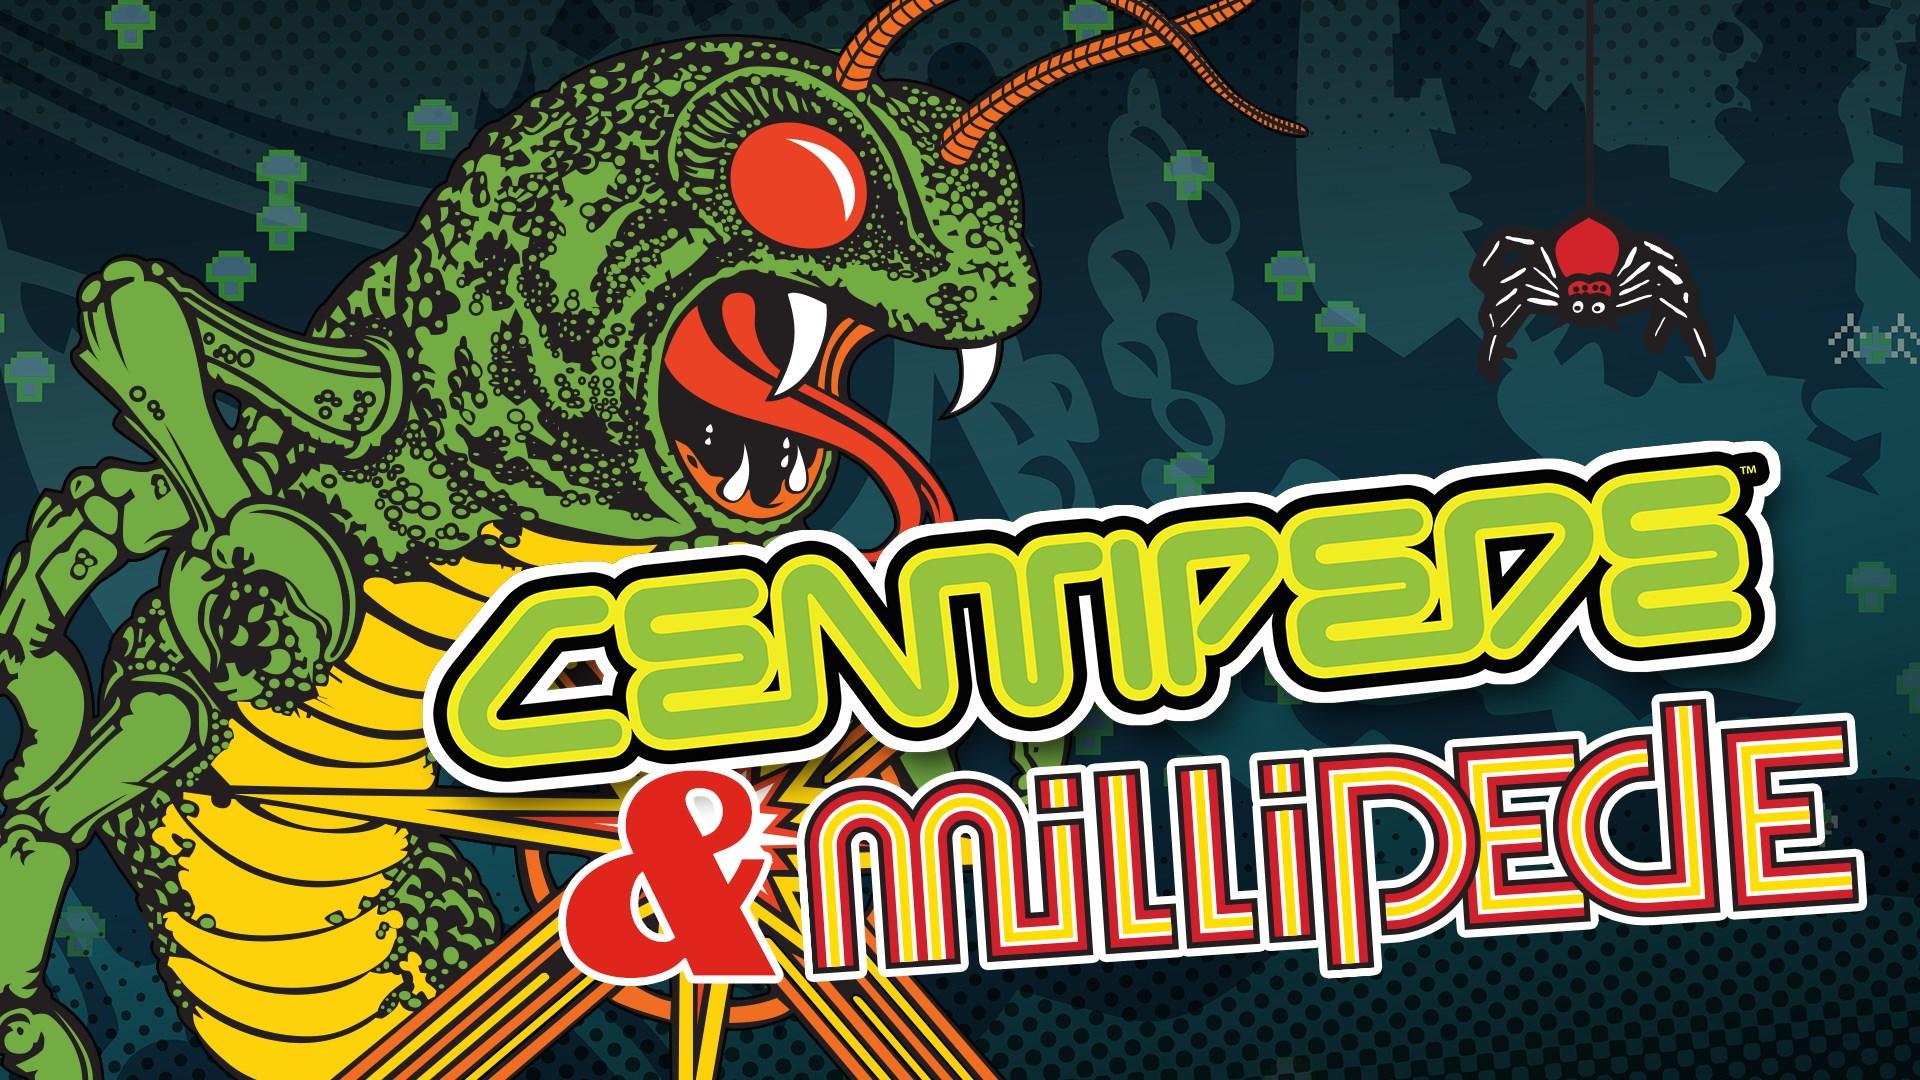 centipede game online free no download